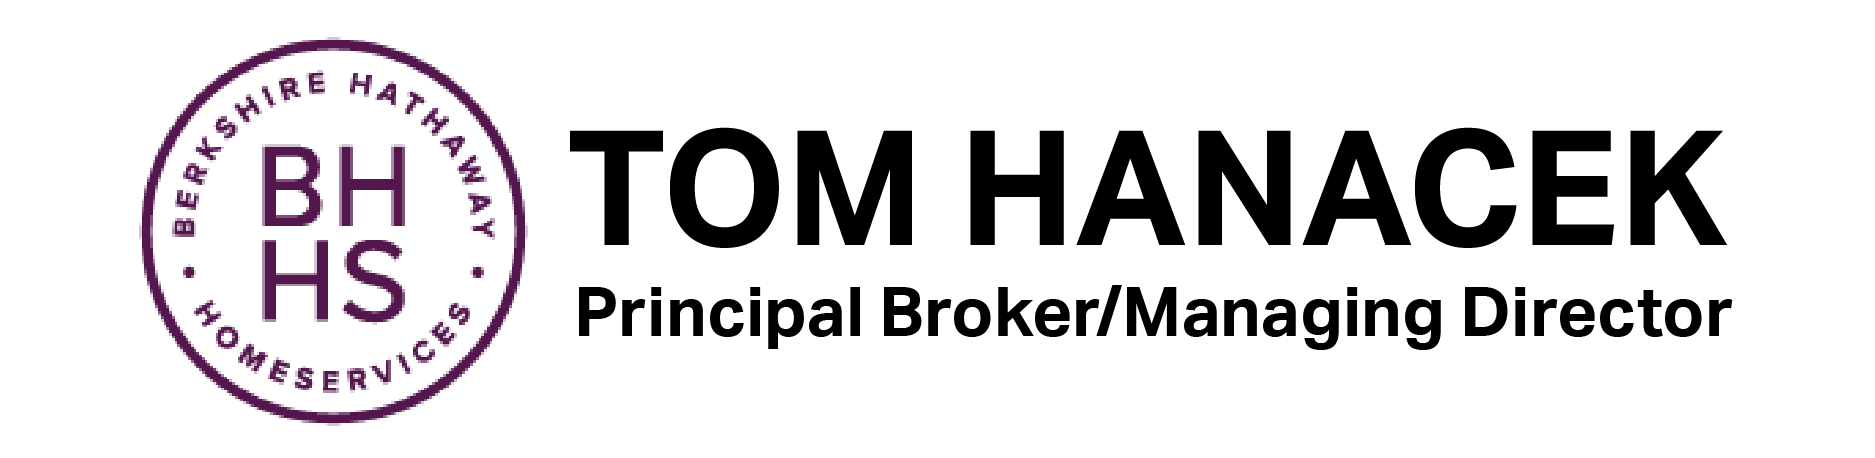 Tom Hanacek